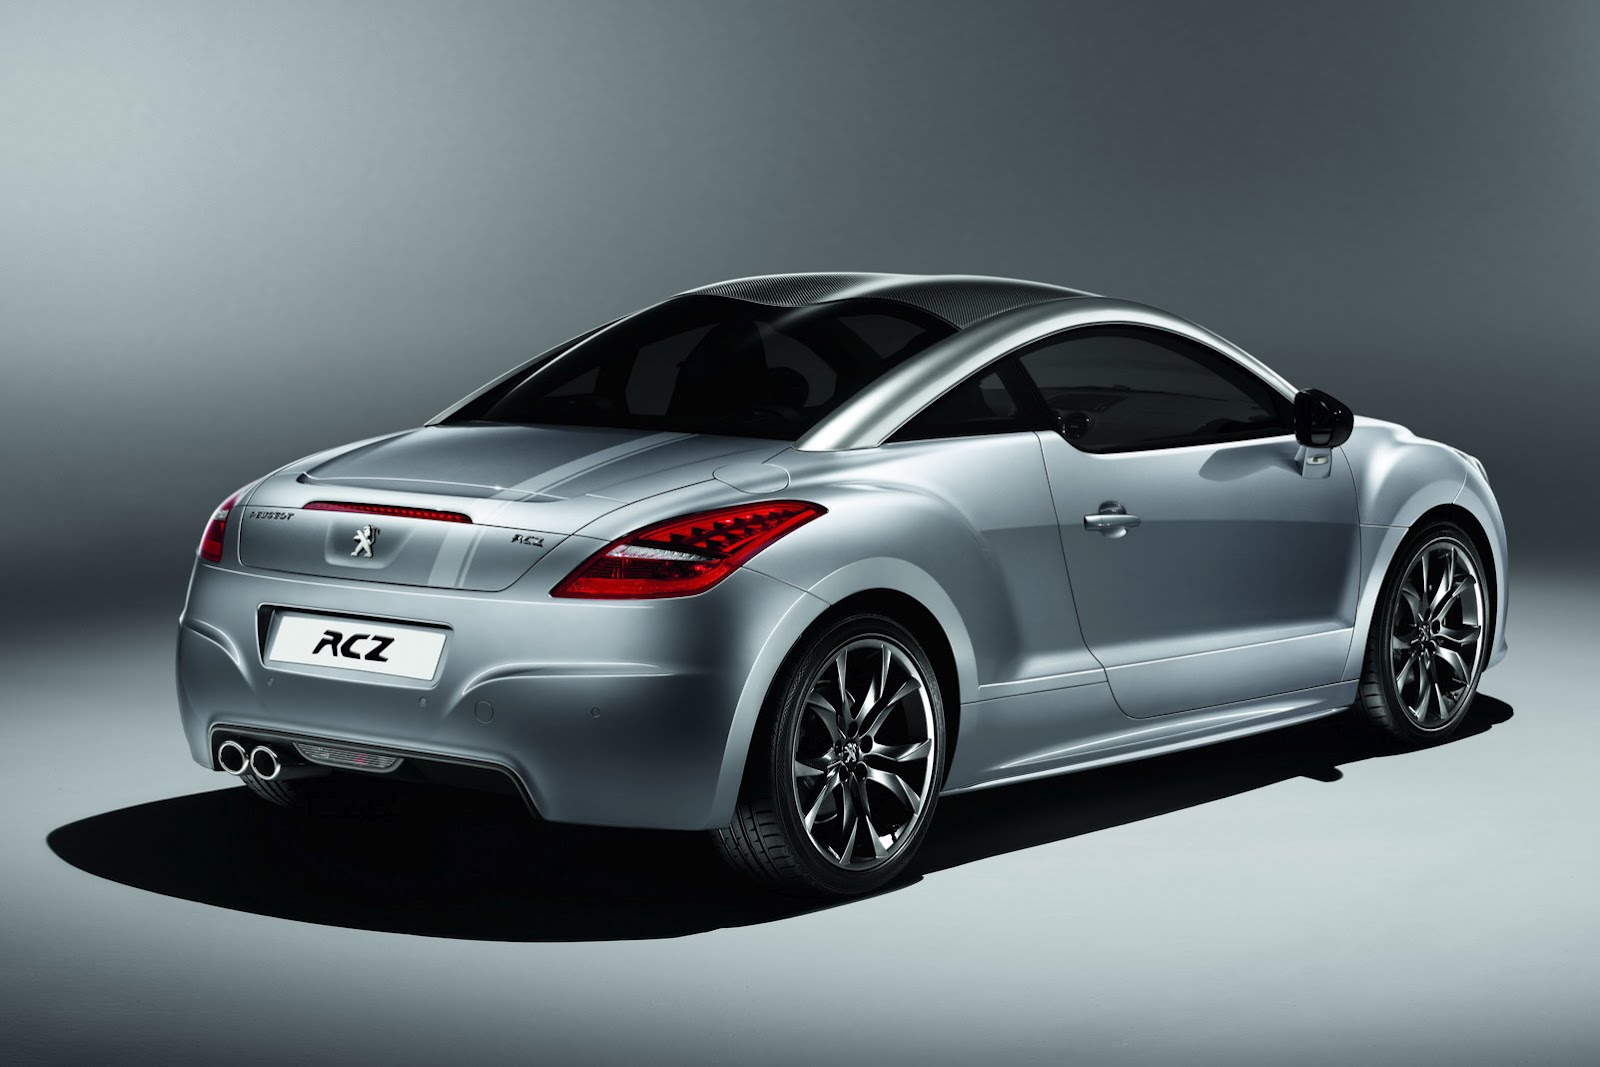 Peugeot выпустил спецверсию модели RCZ - Onyx